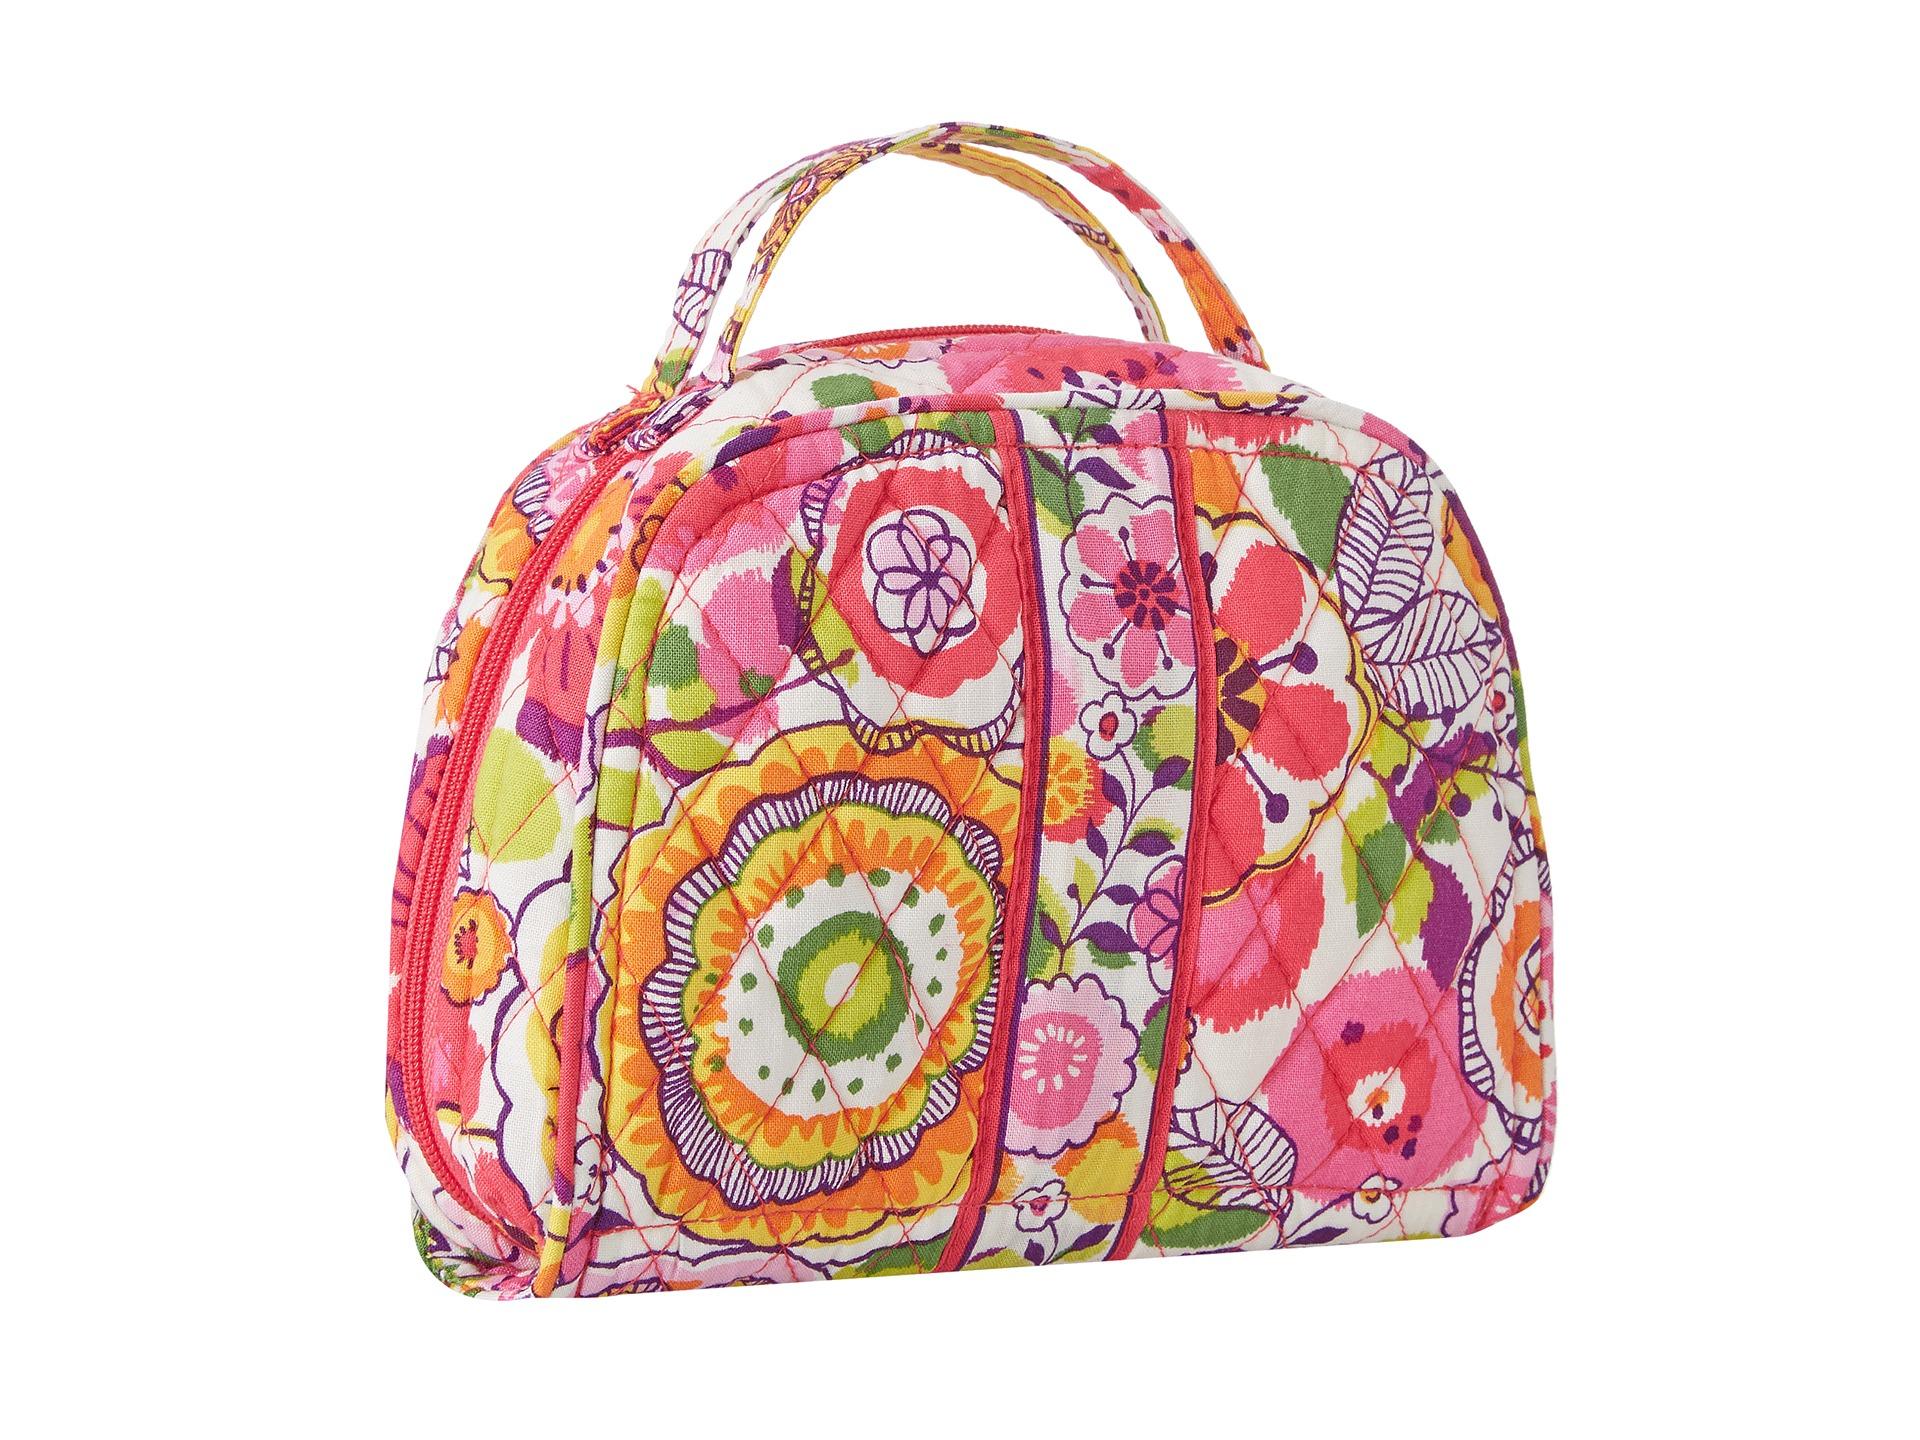 vera bradley luggage travel jewelry organizer clementine